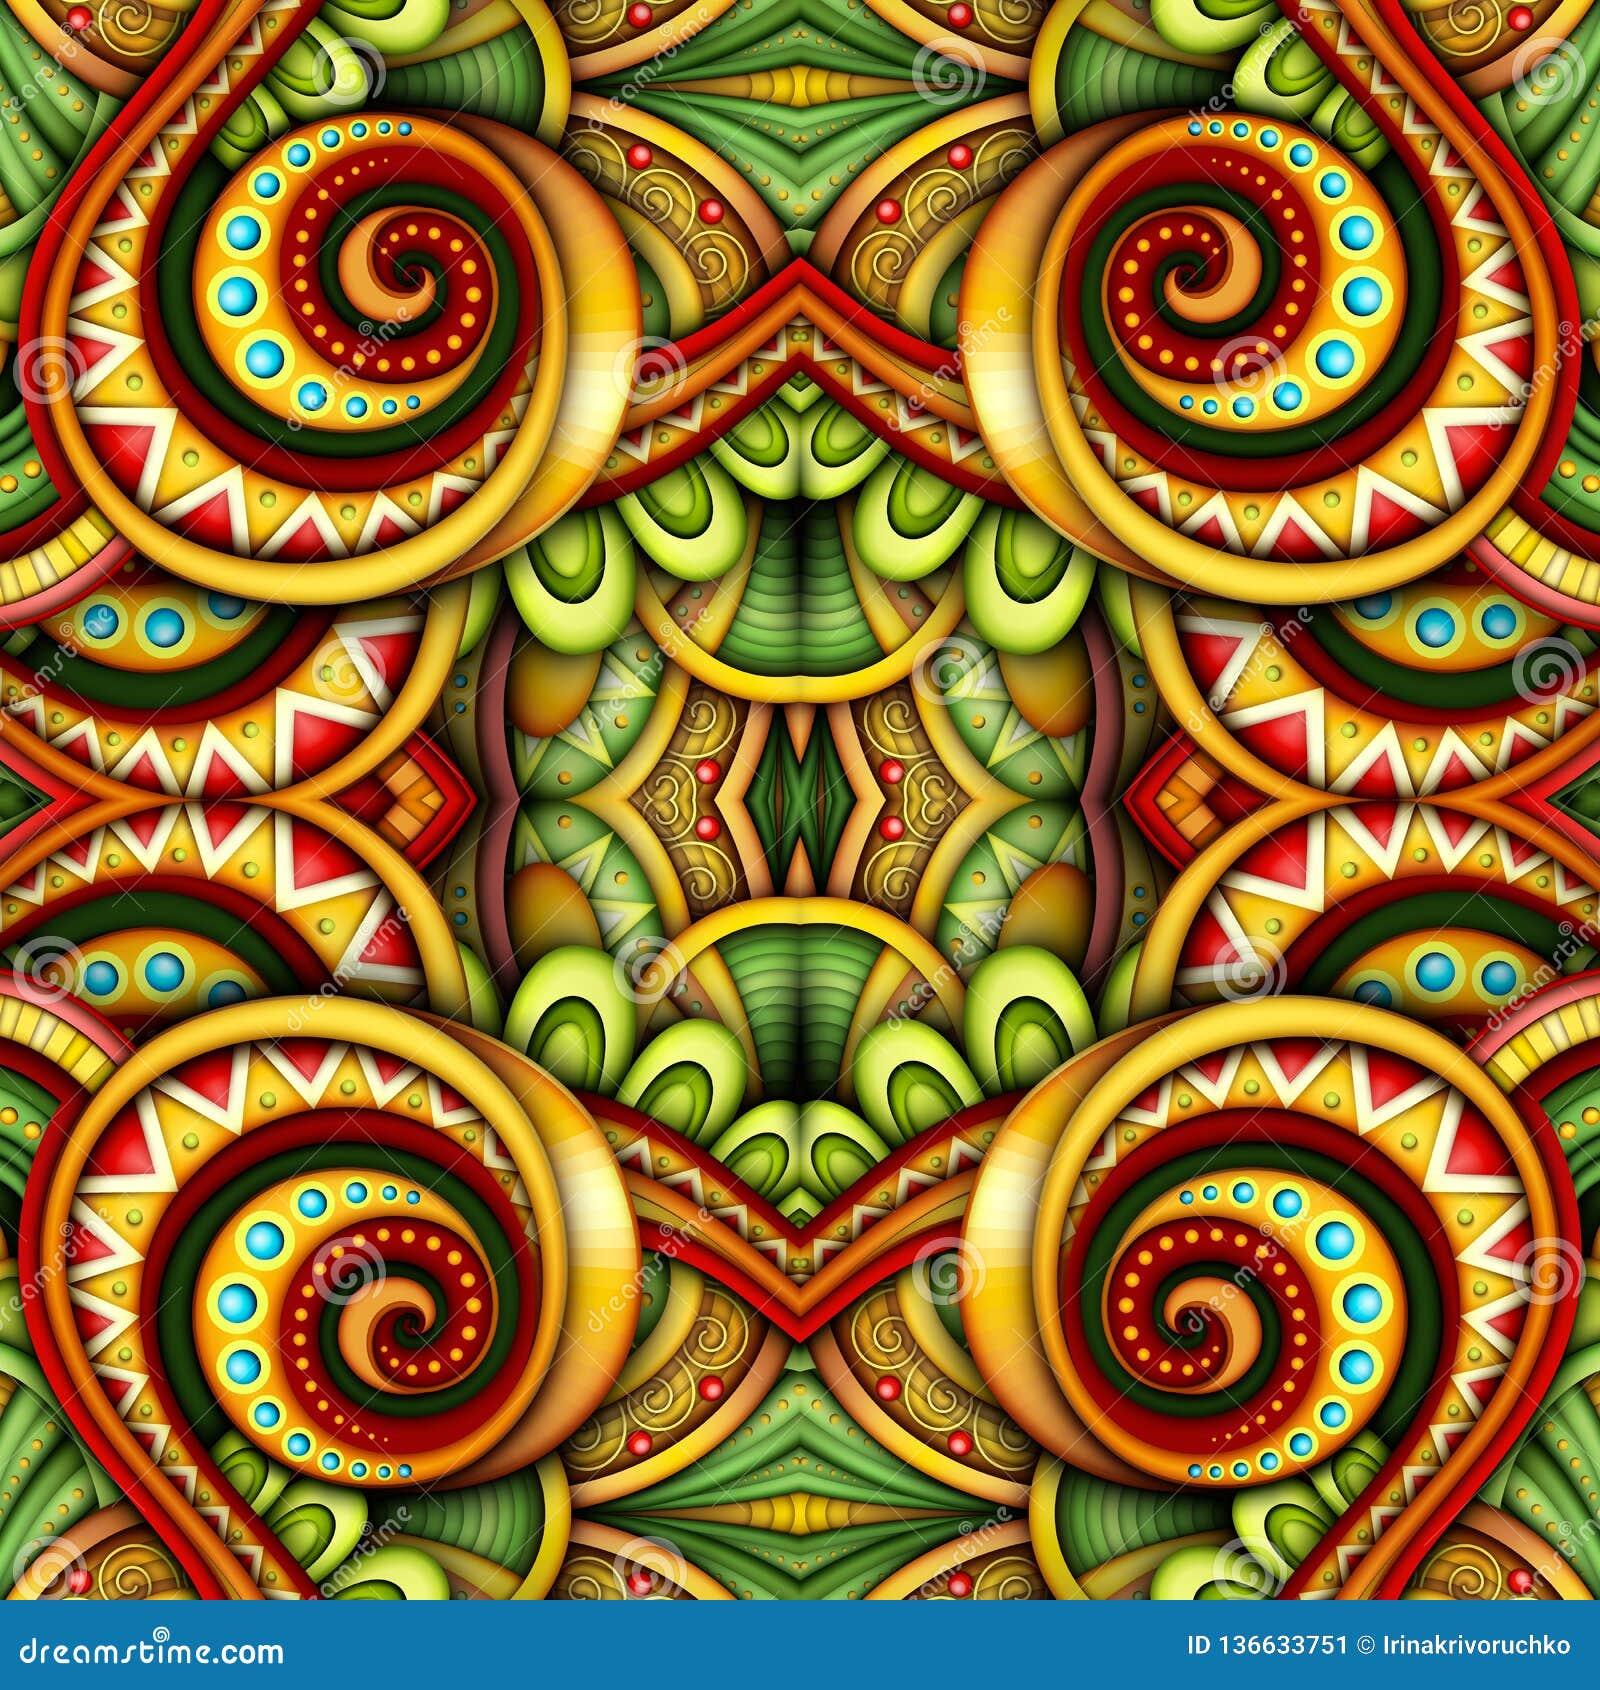 Colored Seamless Tile Pattern, Fantastic Kaleidoscope ...